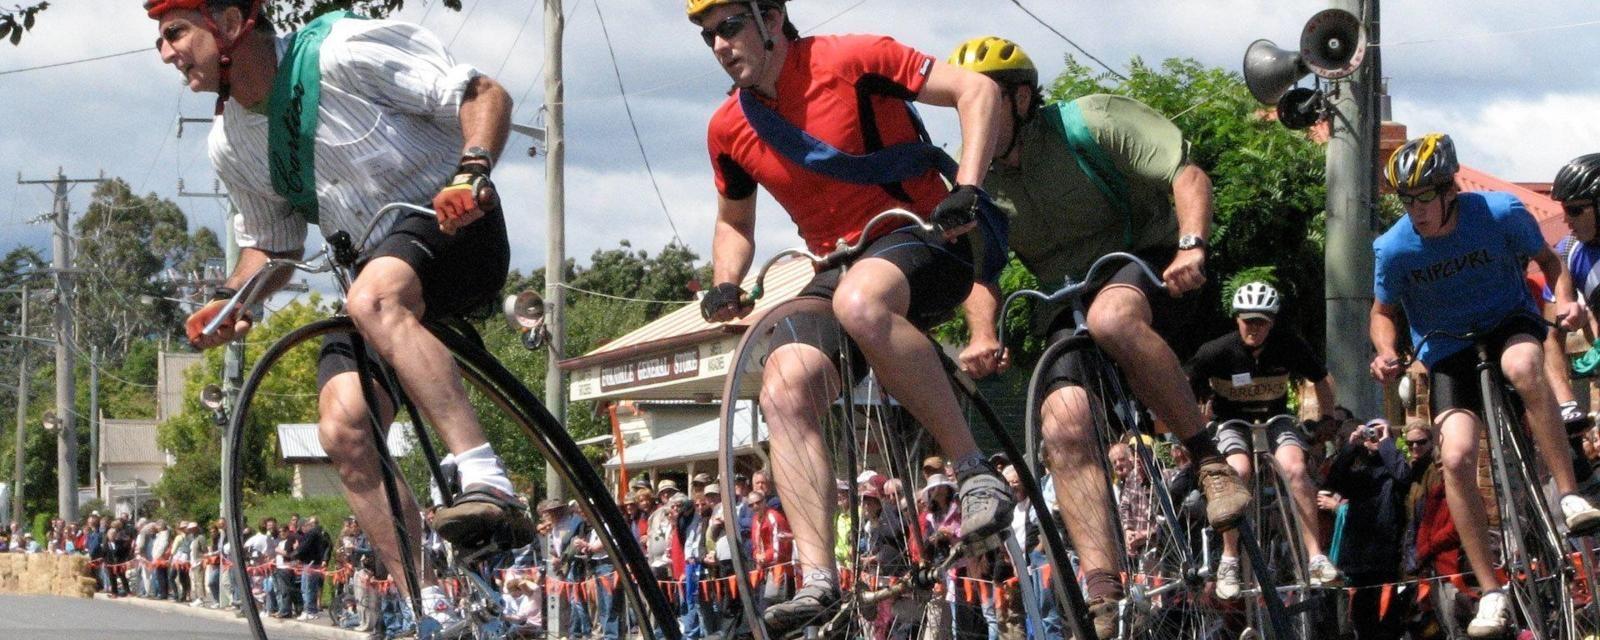 Highwheeling Bike Races In Australia Racing Bikes Bike Types Of Cycling